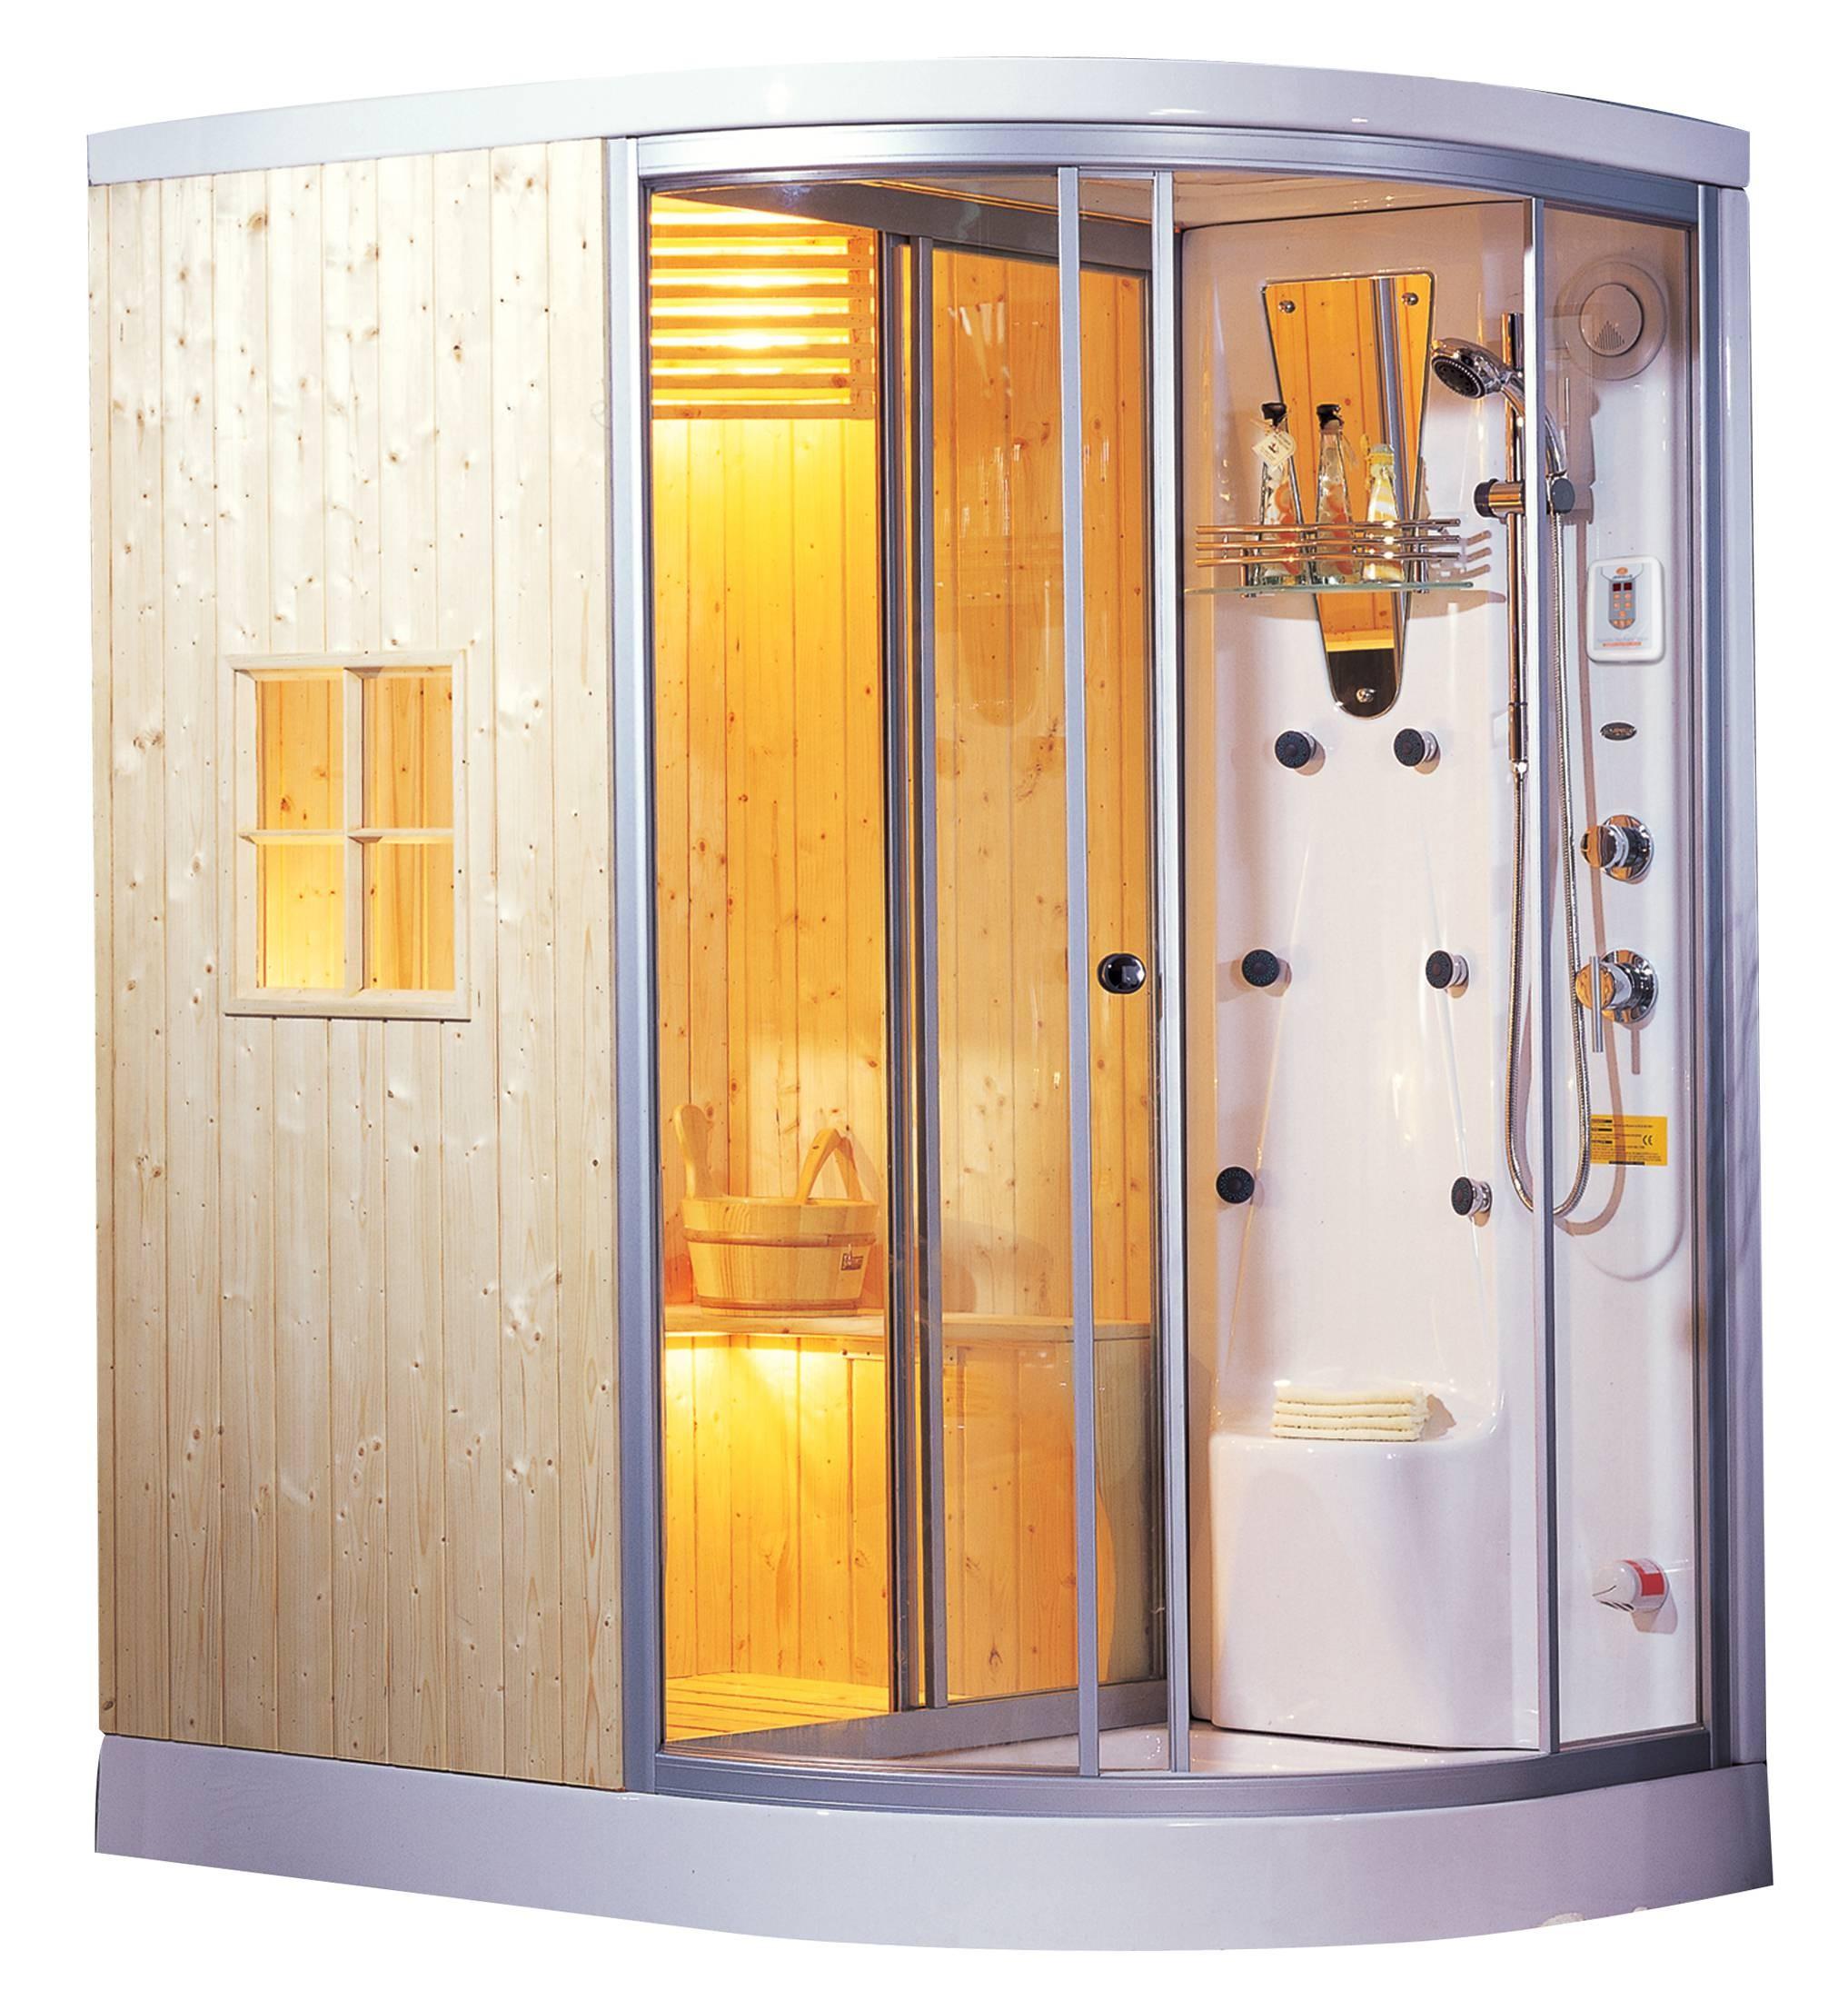 cabina de sauna y vapor madera natural sellada ag 0201